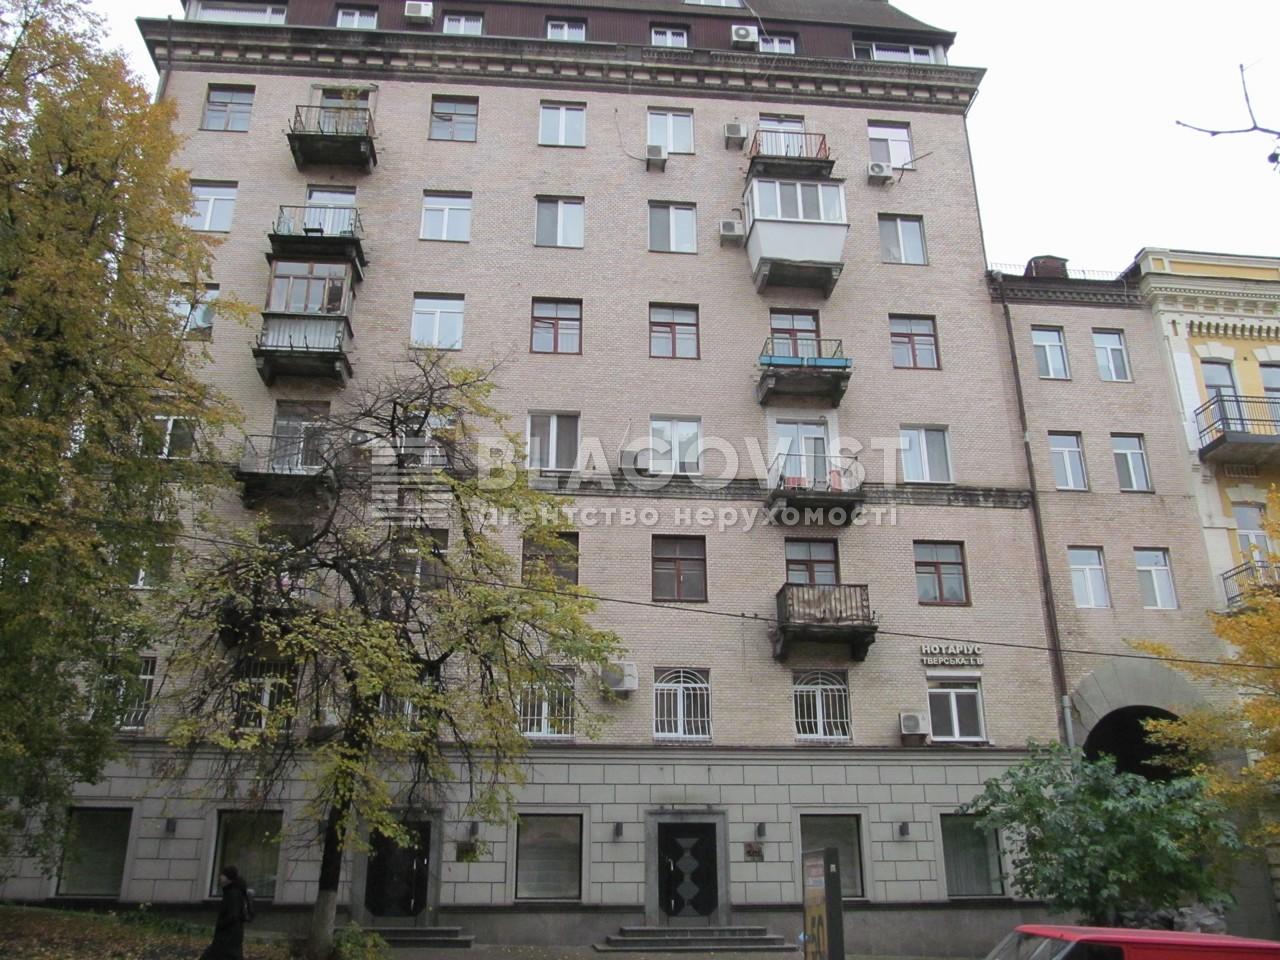 Квартира R-40160, Хмельницкого Богдана, 49, Киев - Фото 2